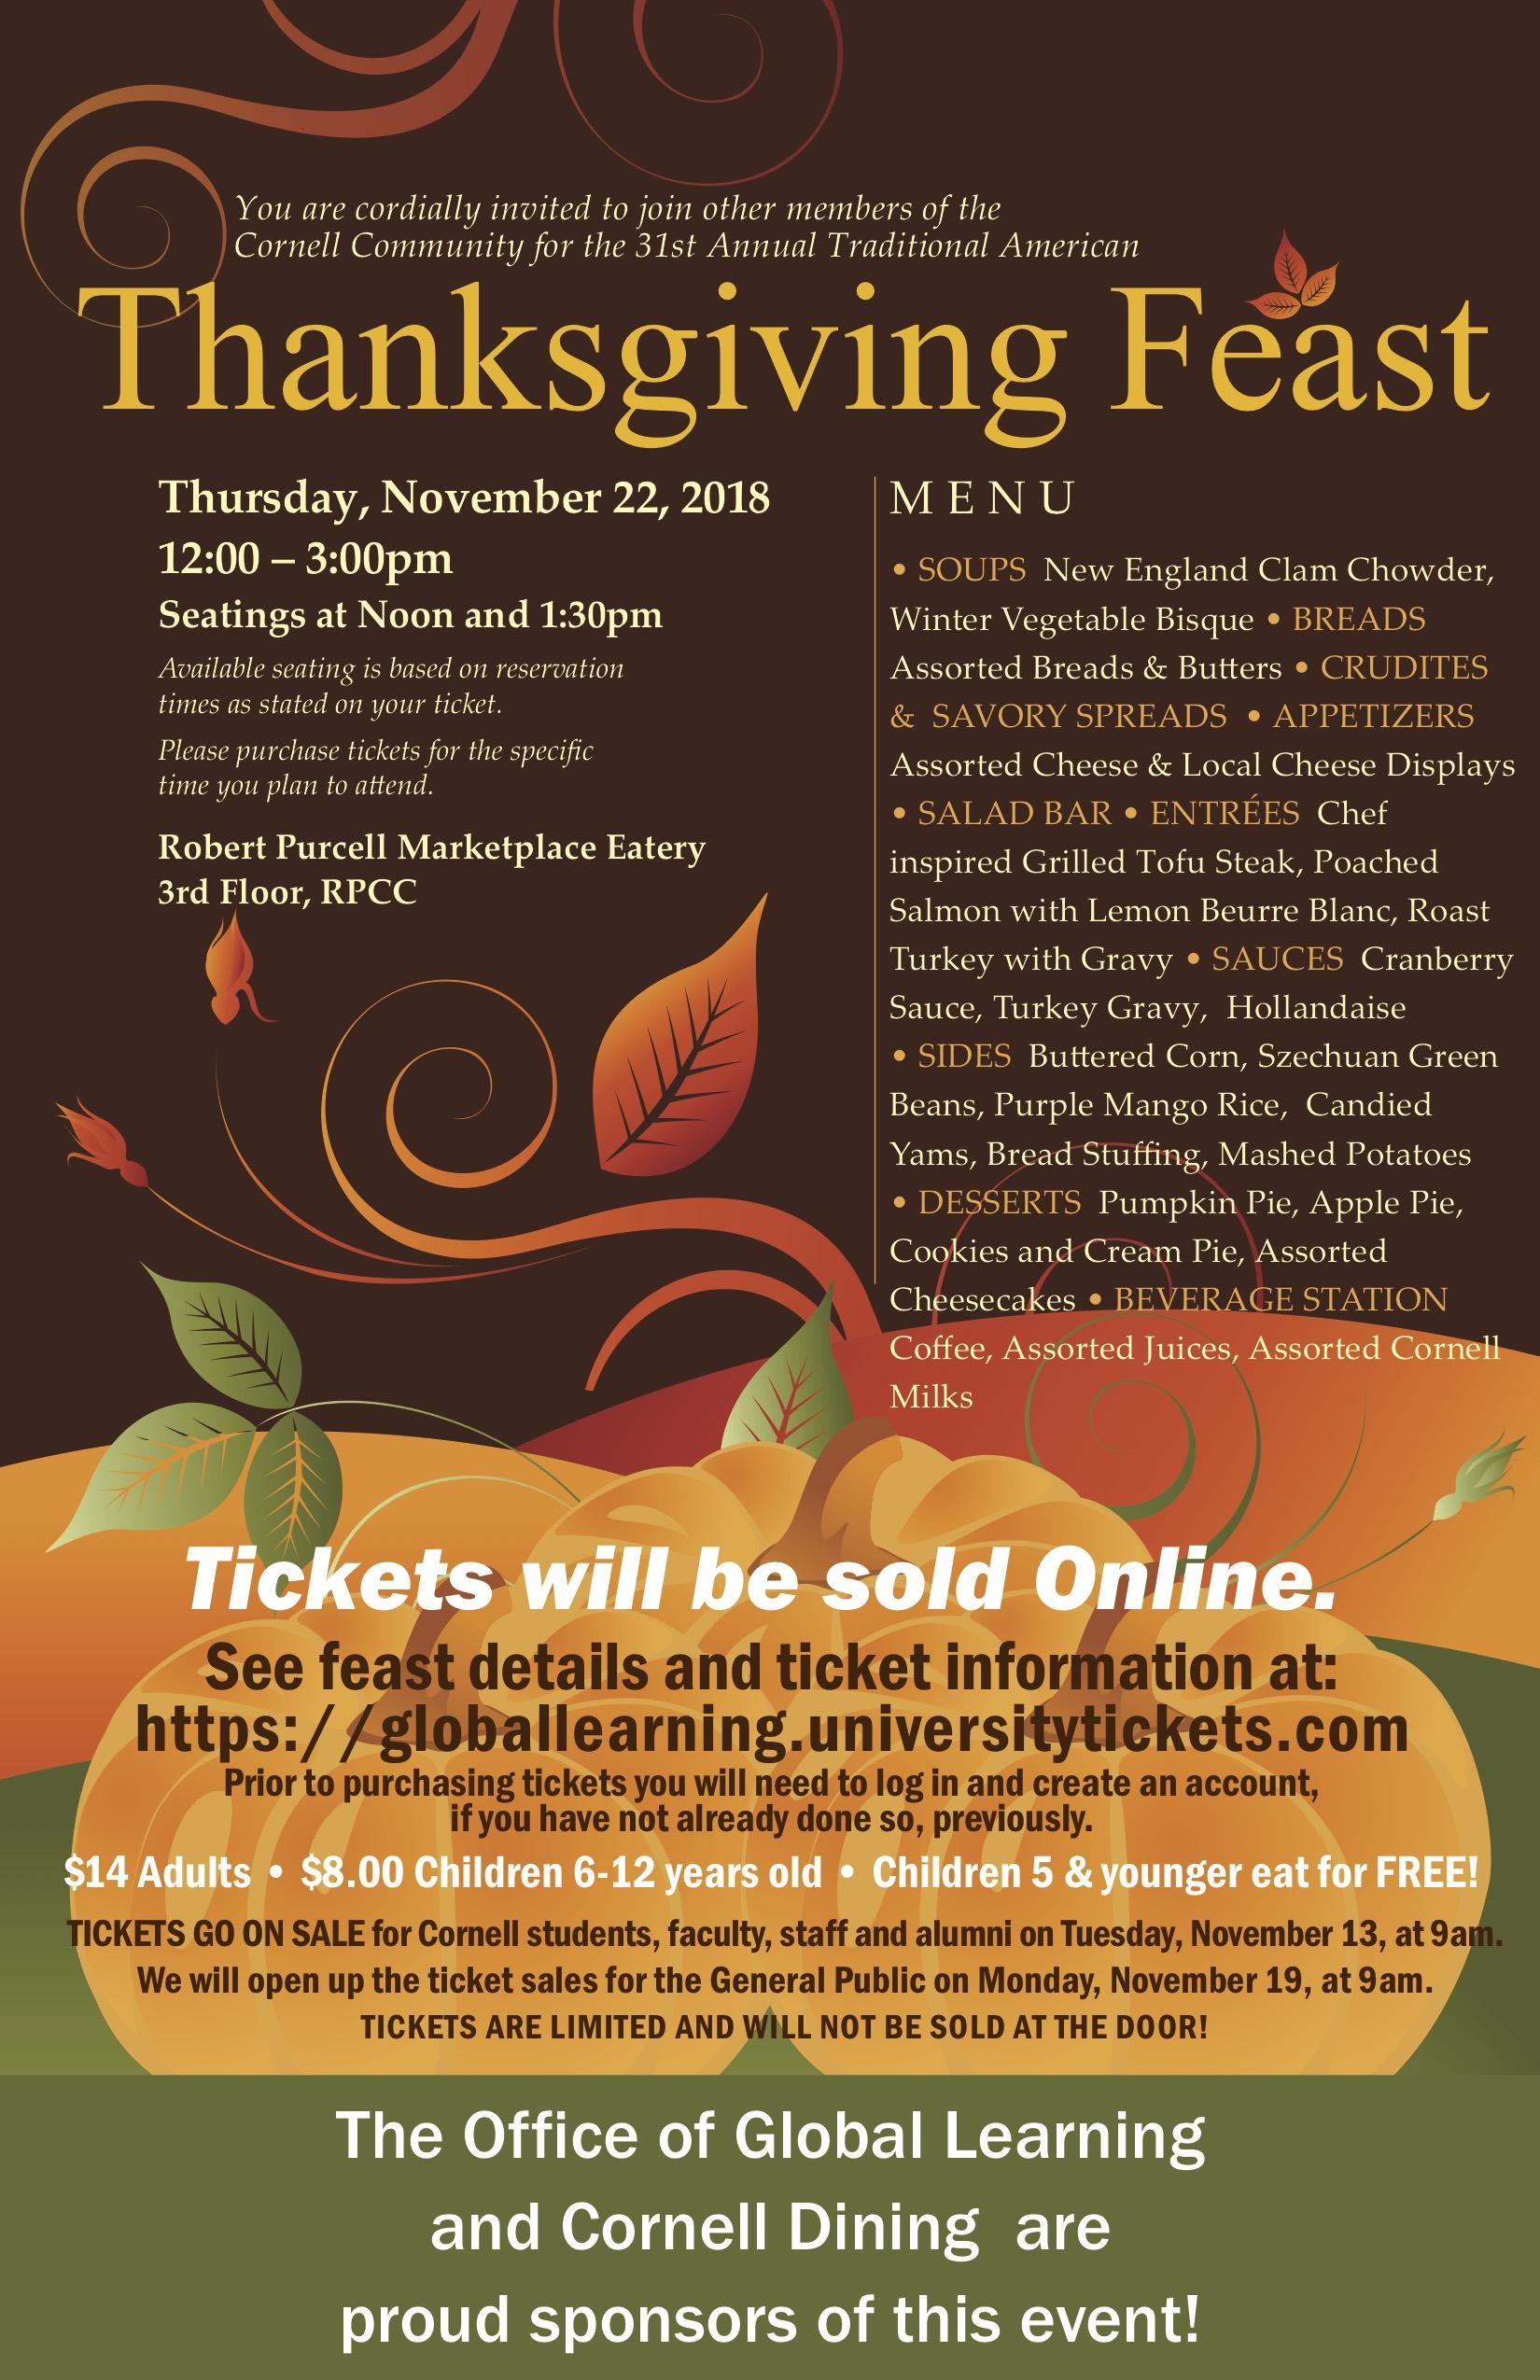 Thanksgiving Feast 2018